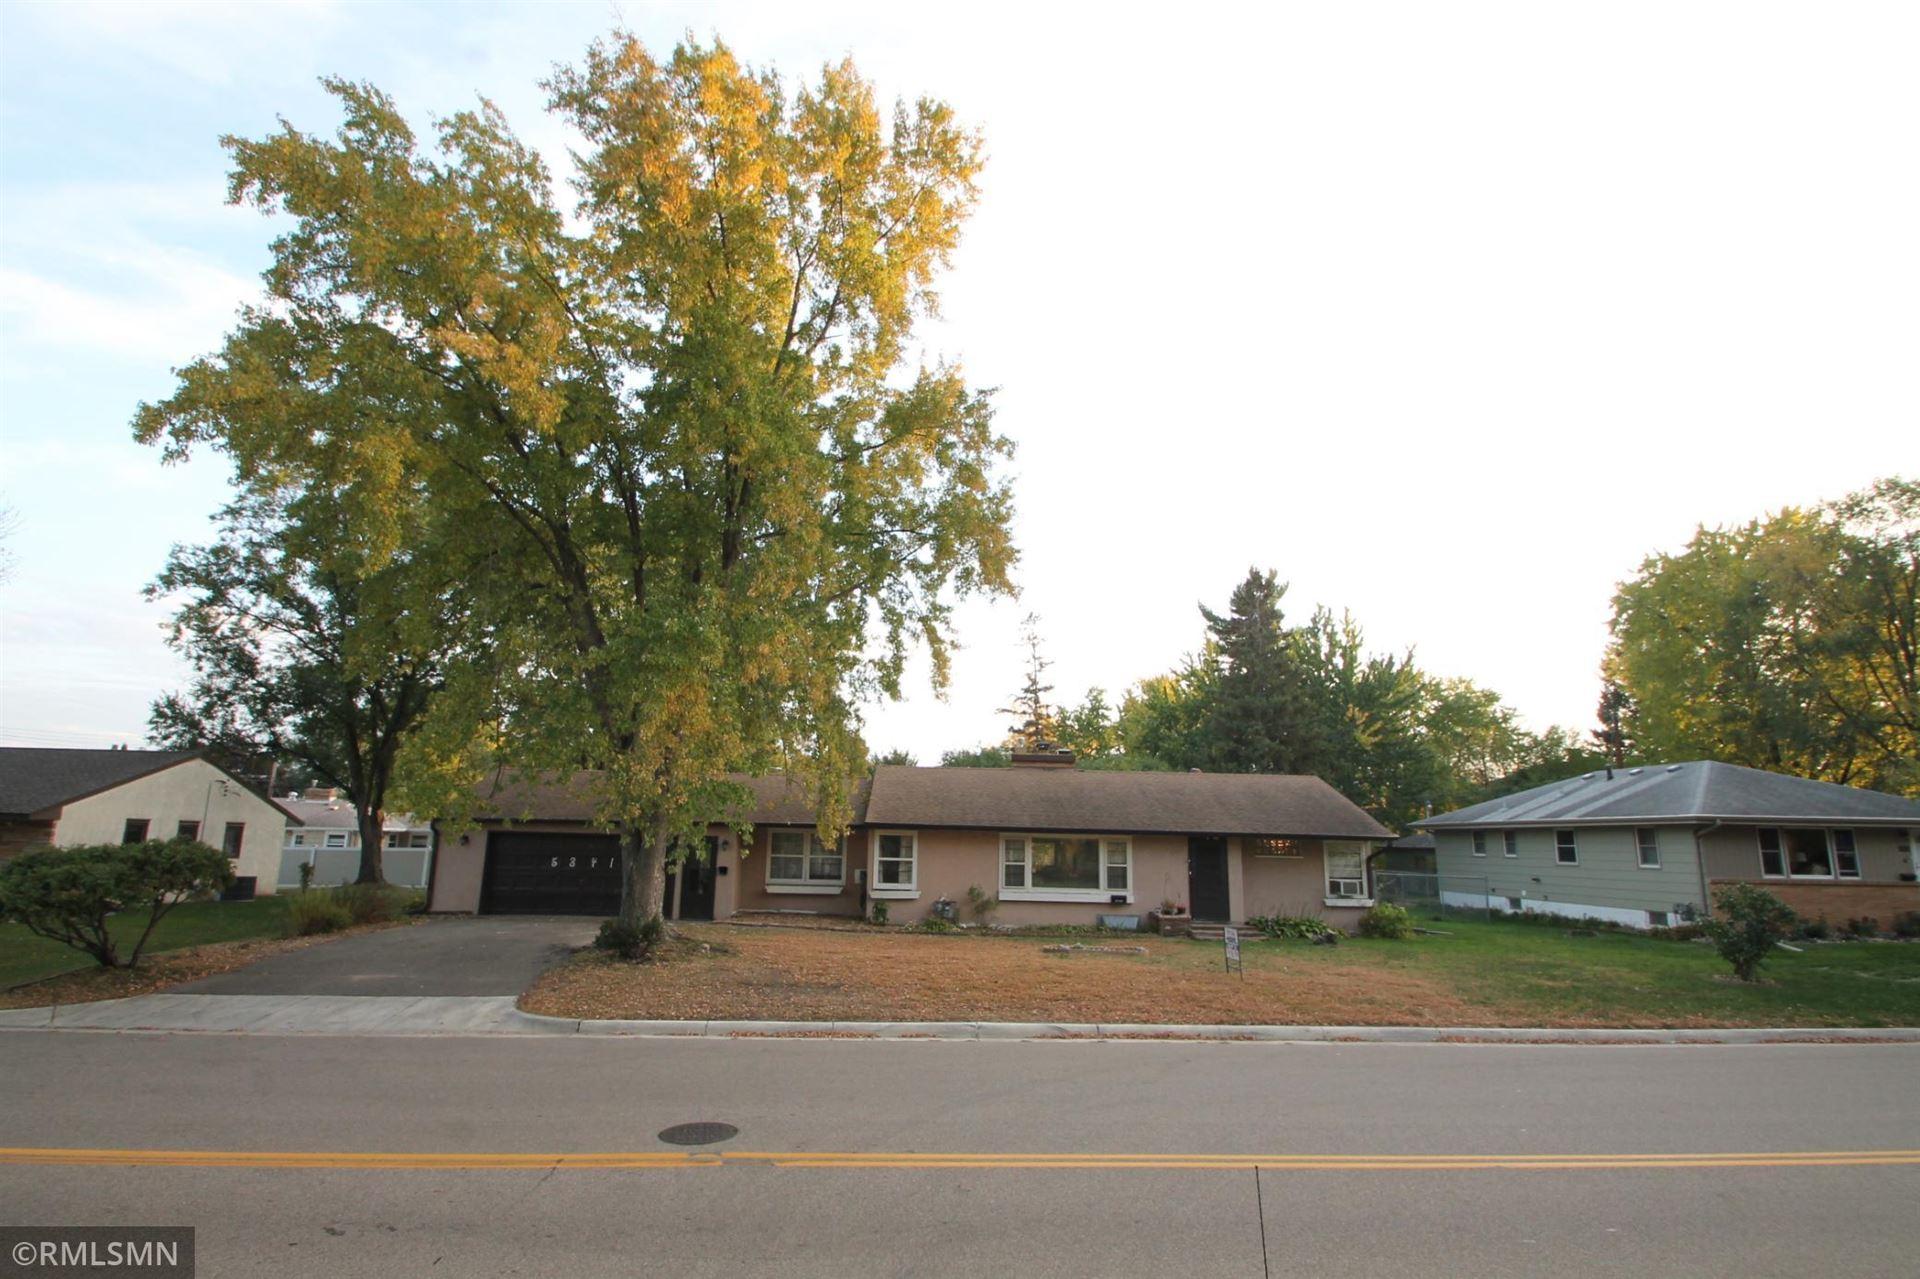 Photo of 5341 47th Avenue N, Robbinsdale, MN 55422 (MLS # 6103548)